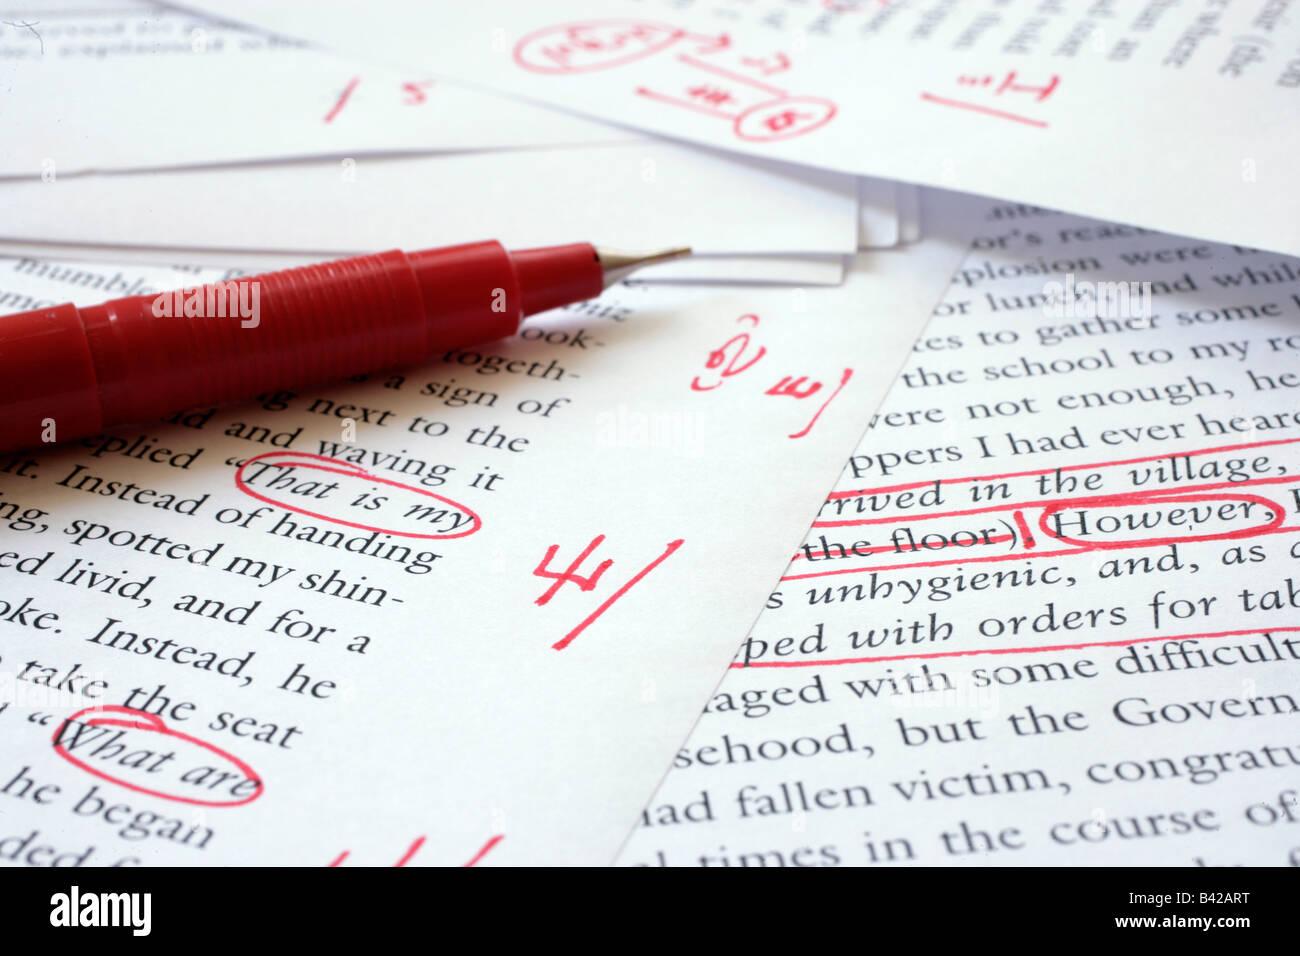 Editing an English language document - Stock Image